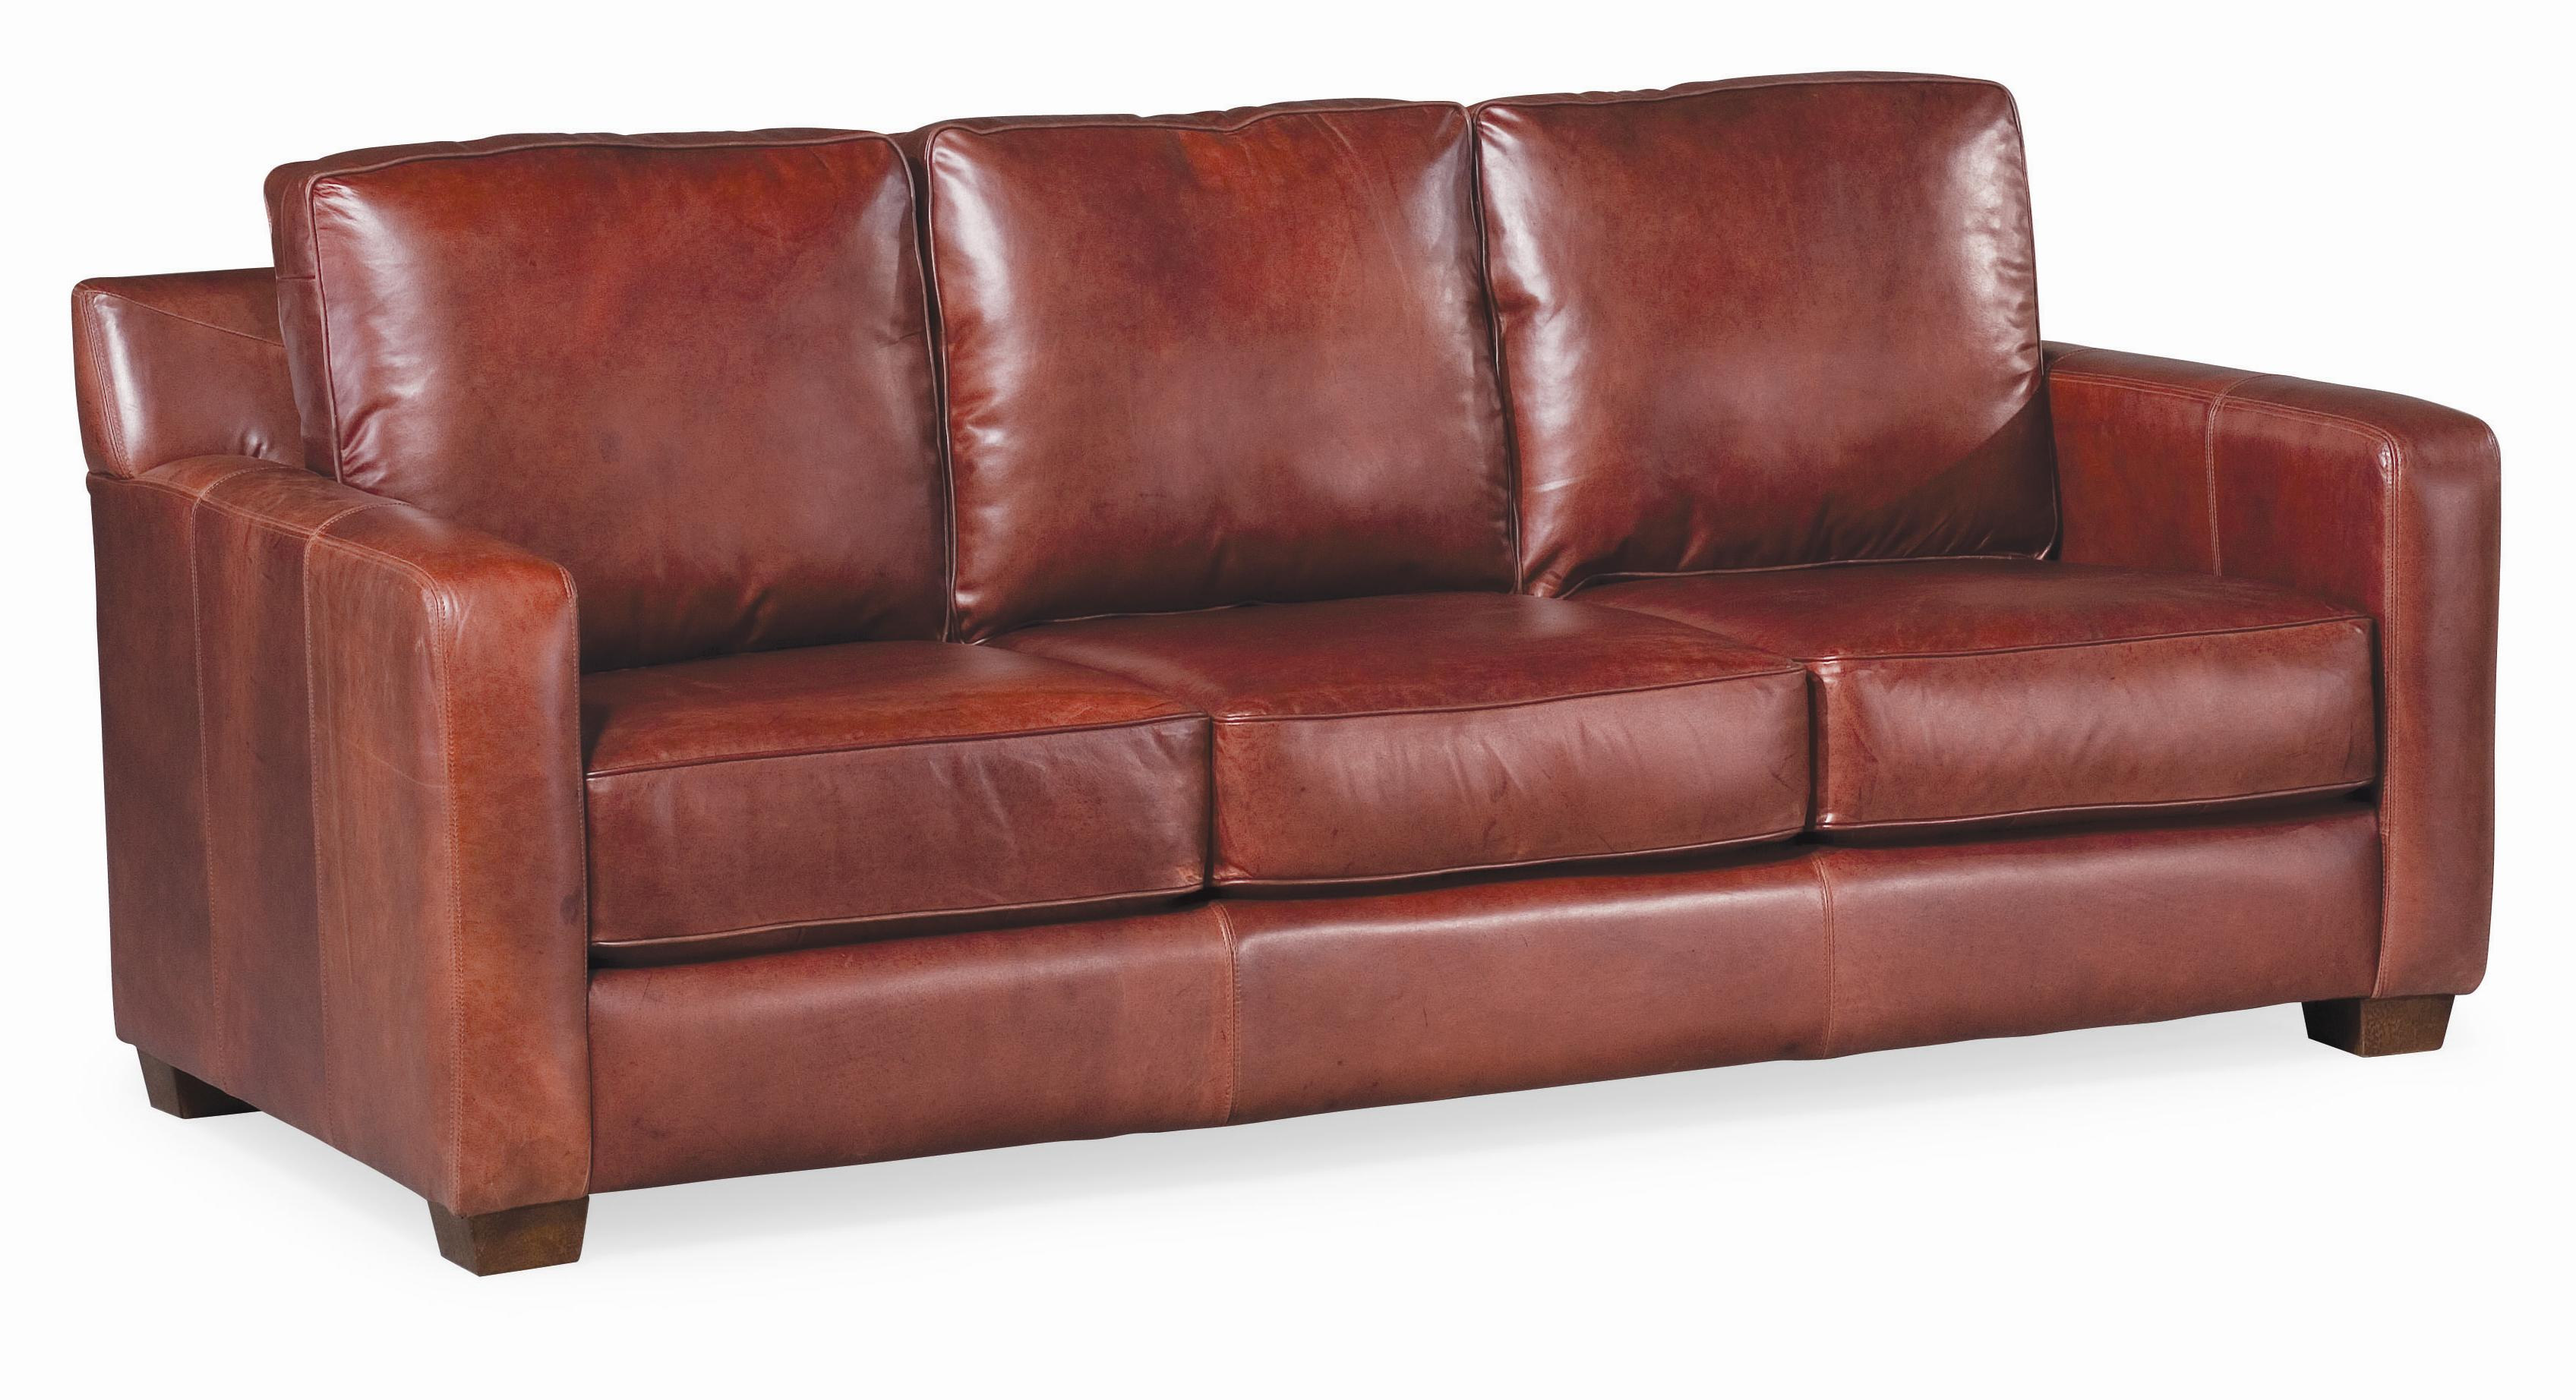 thomasville benjamin leather sofa cheap los angeles surrey